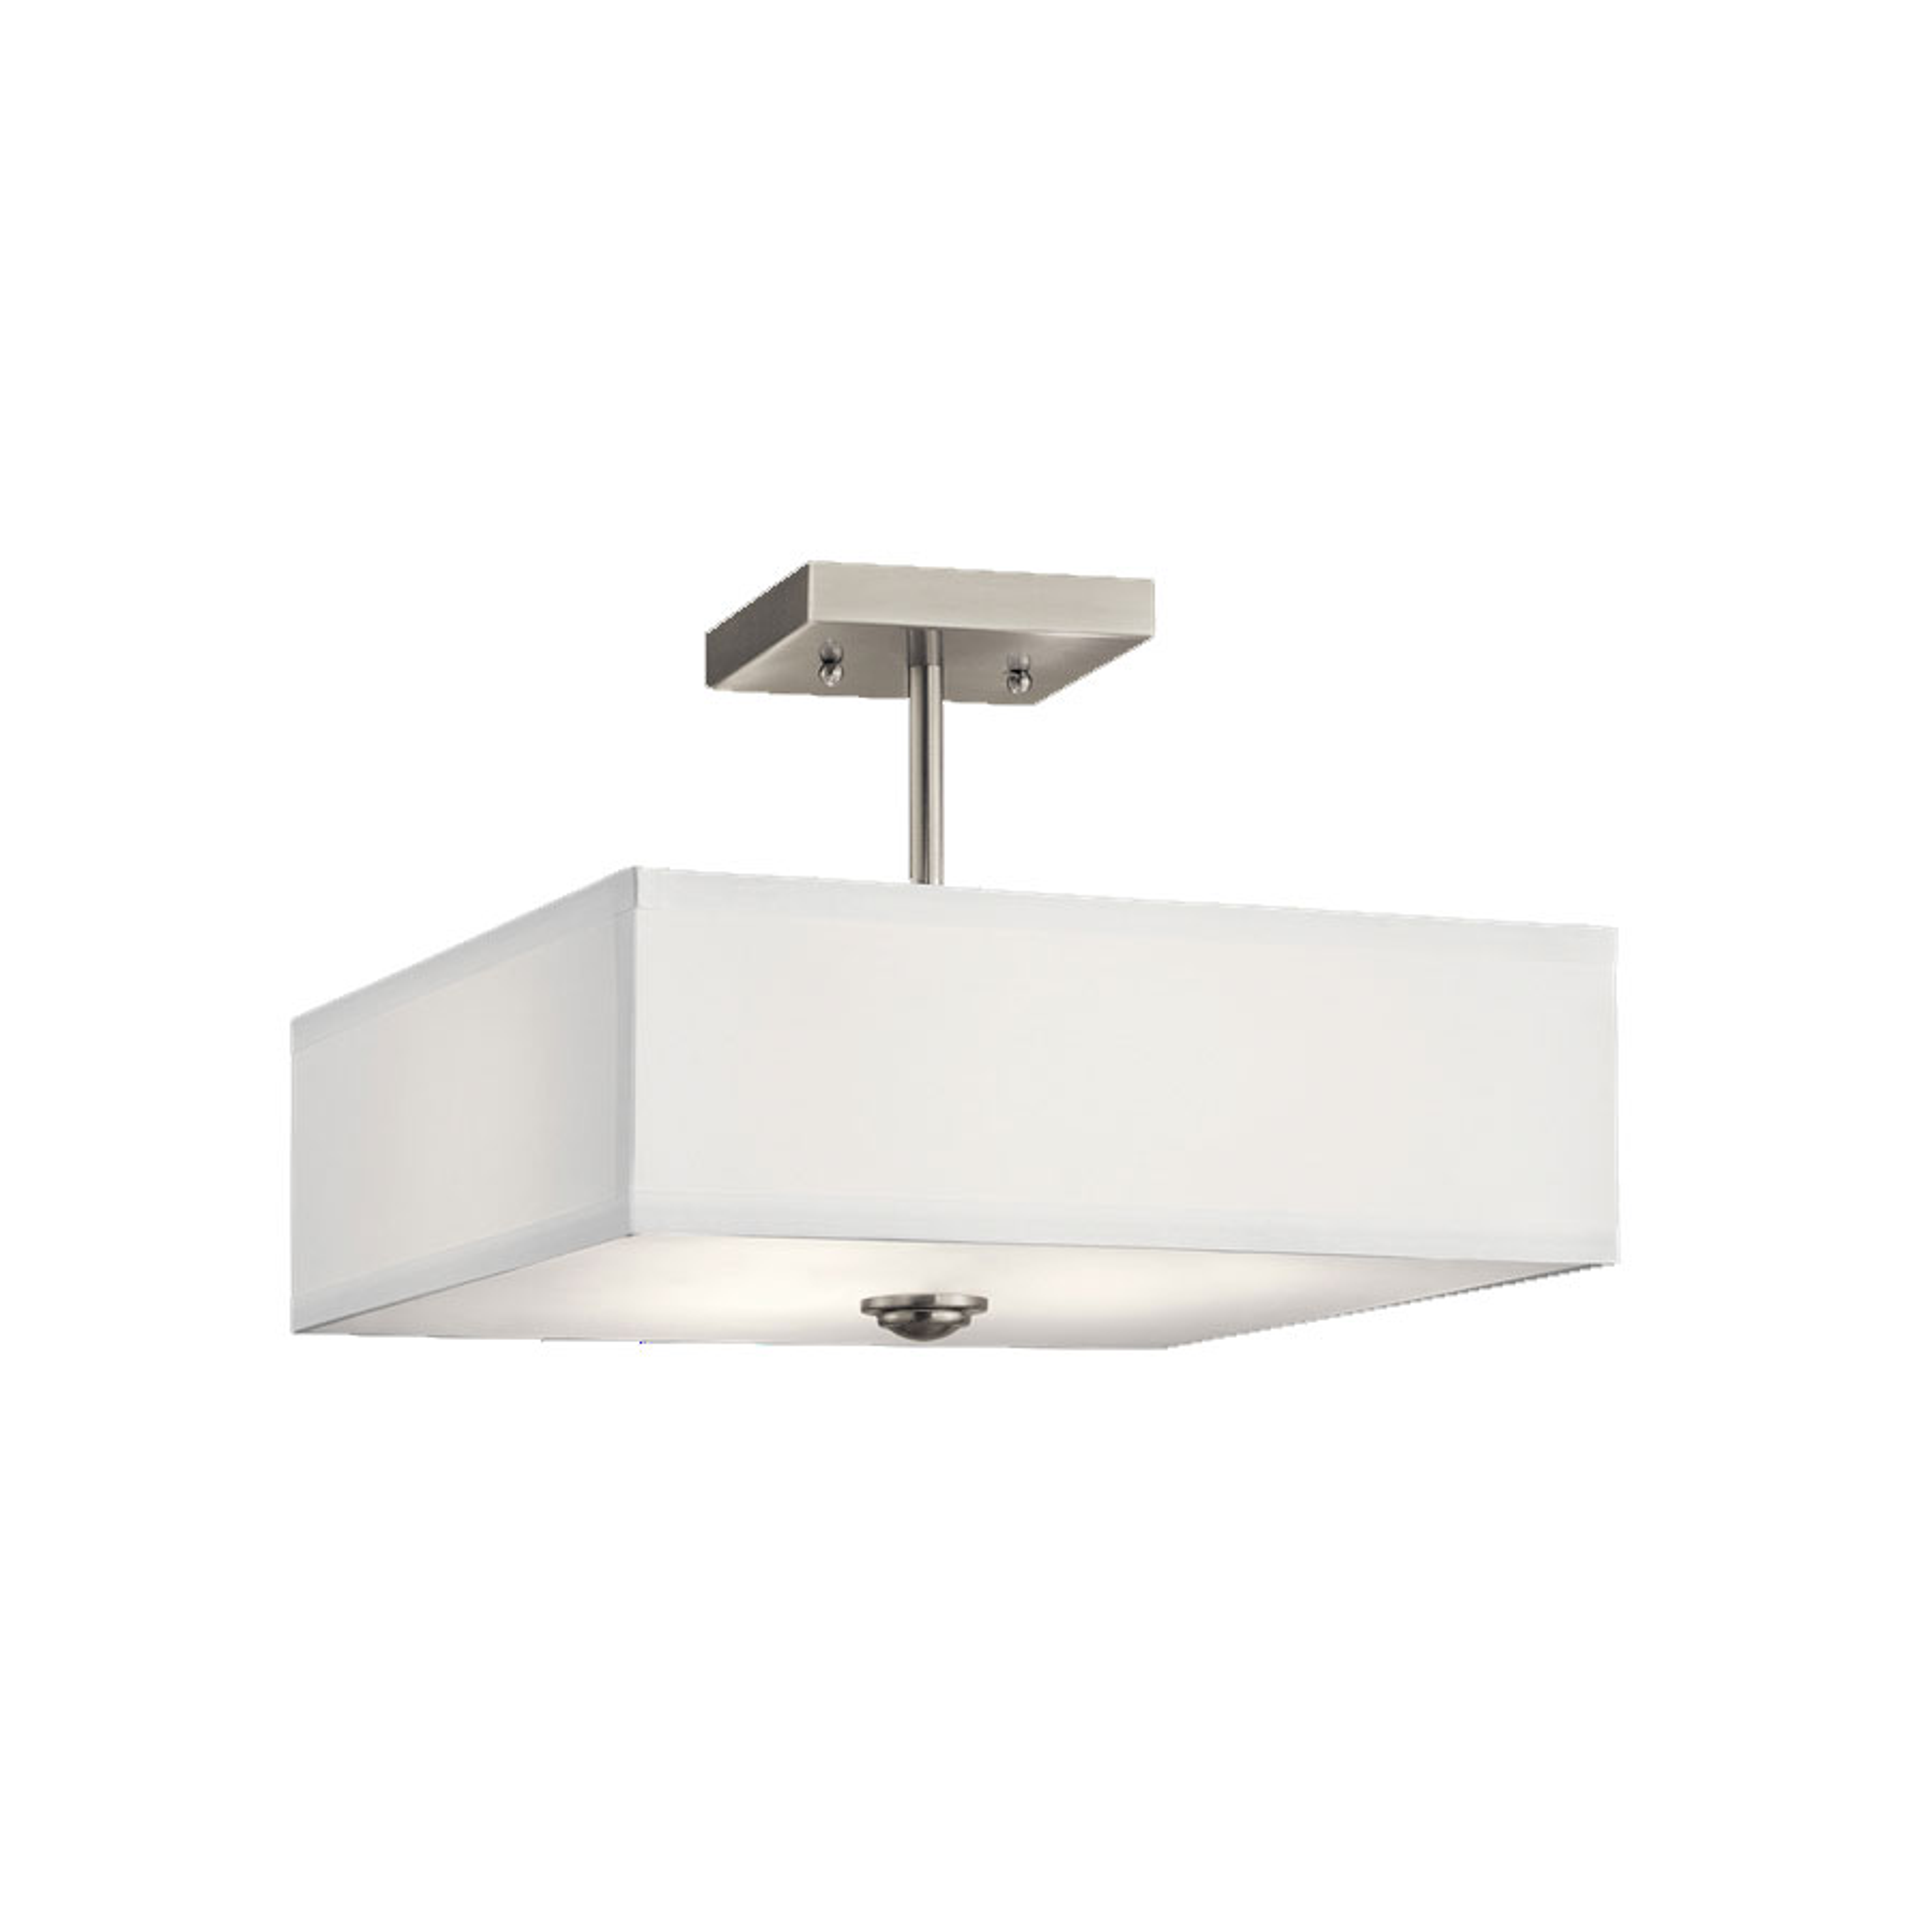 Shailene Square Semi Flush Ceiling Light By Kichler 43691ni